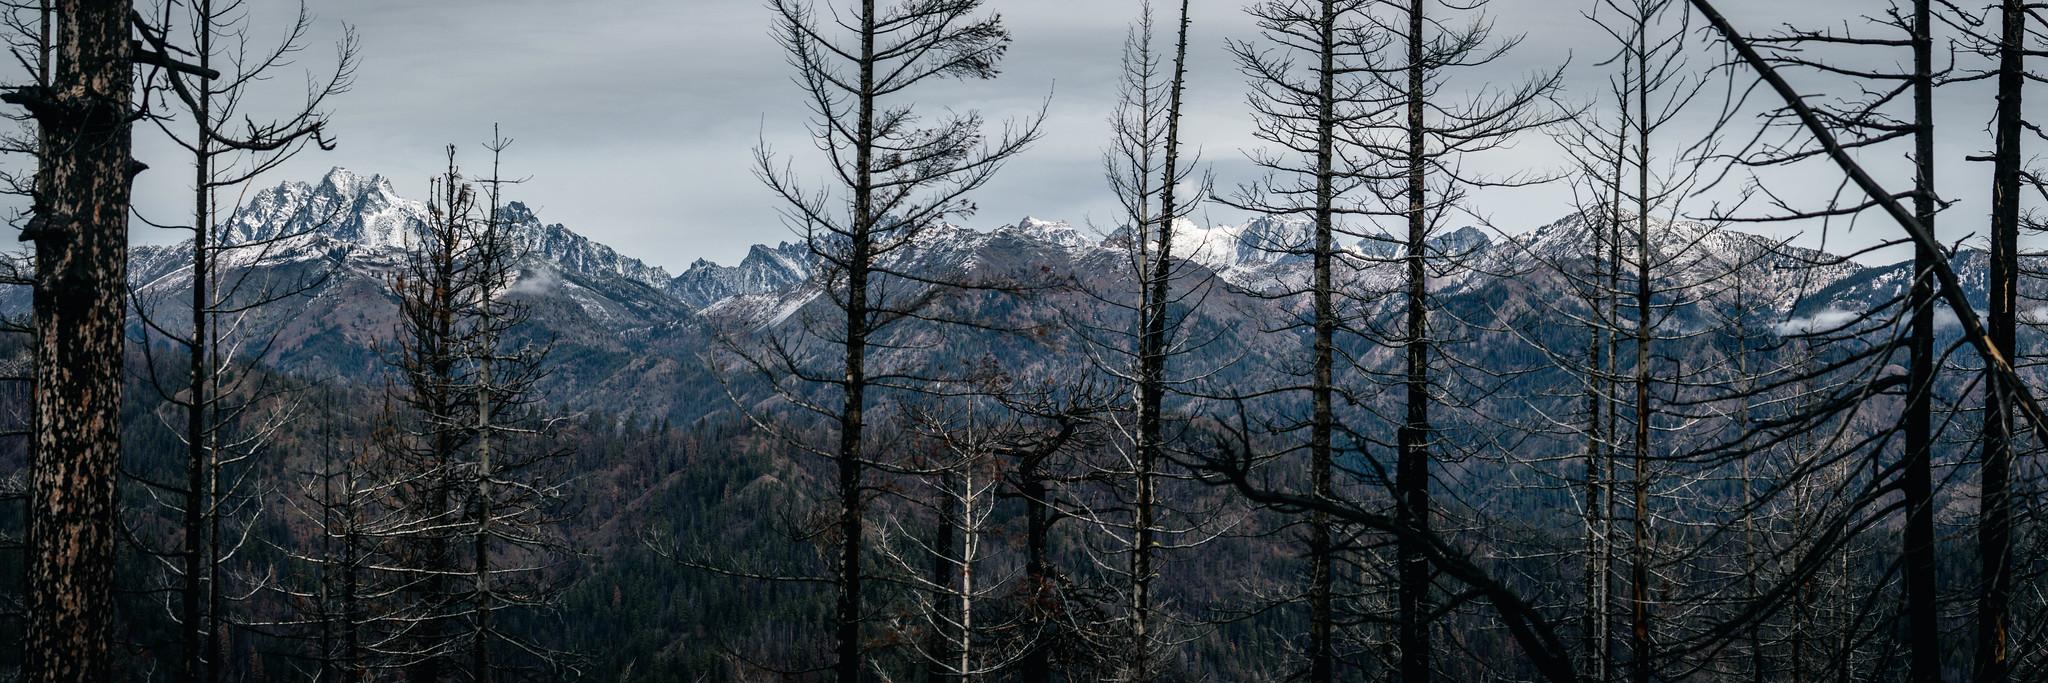 Stuart Range panoramic view through trees